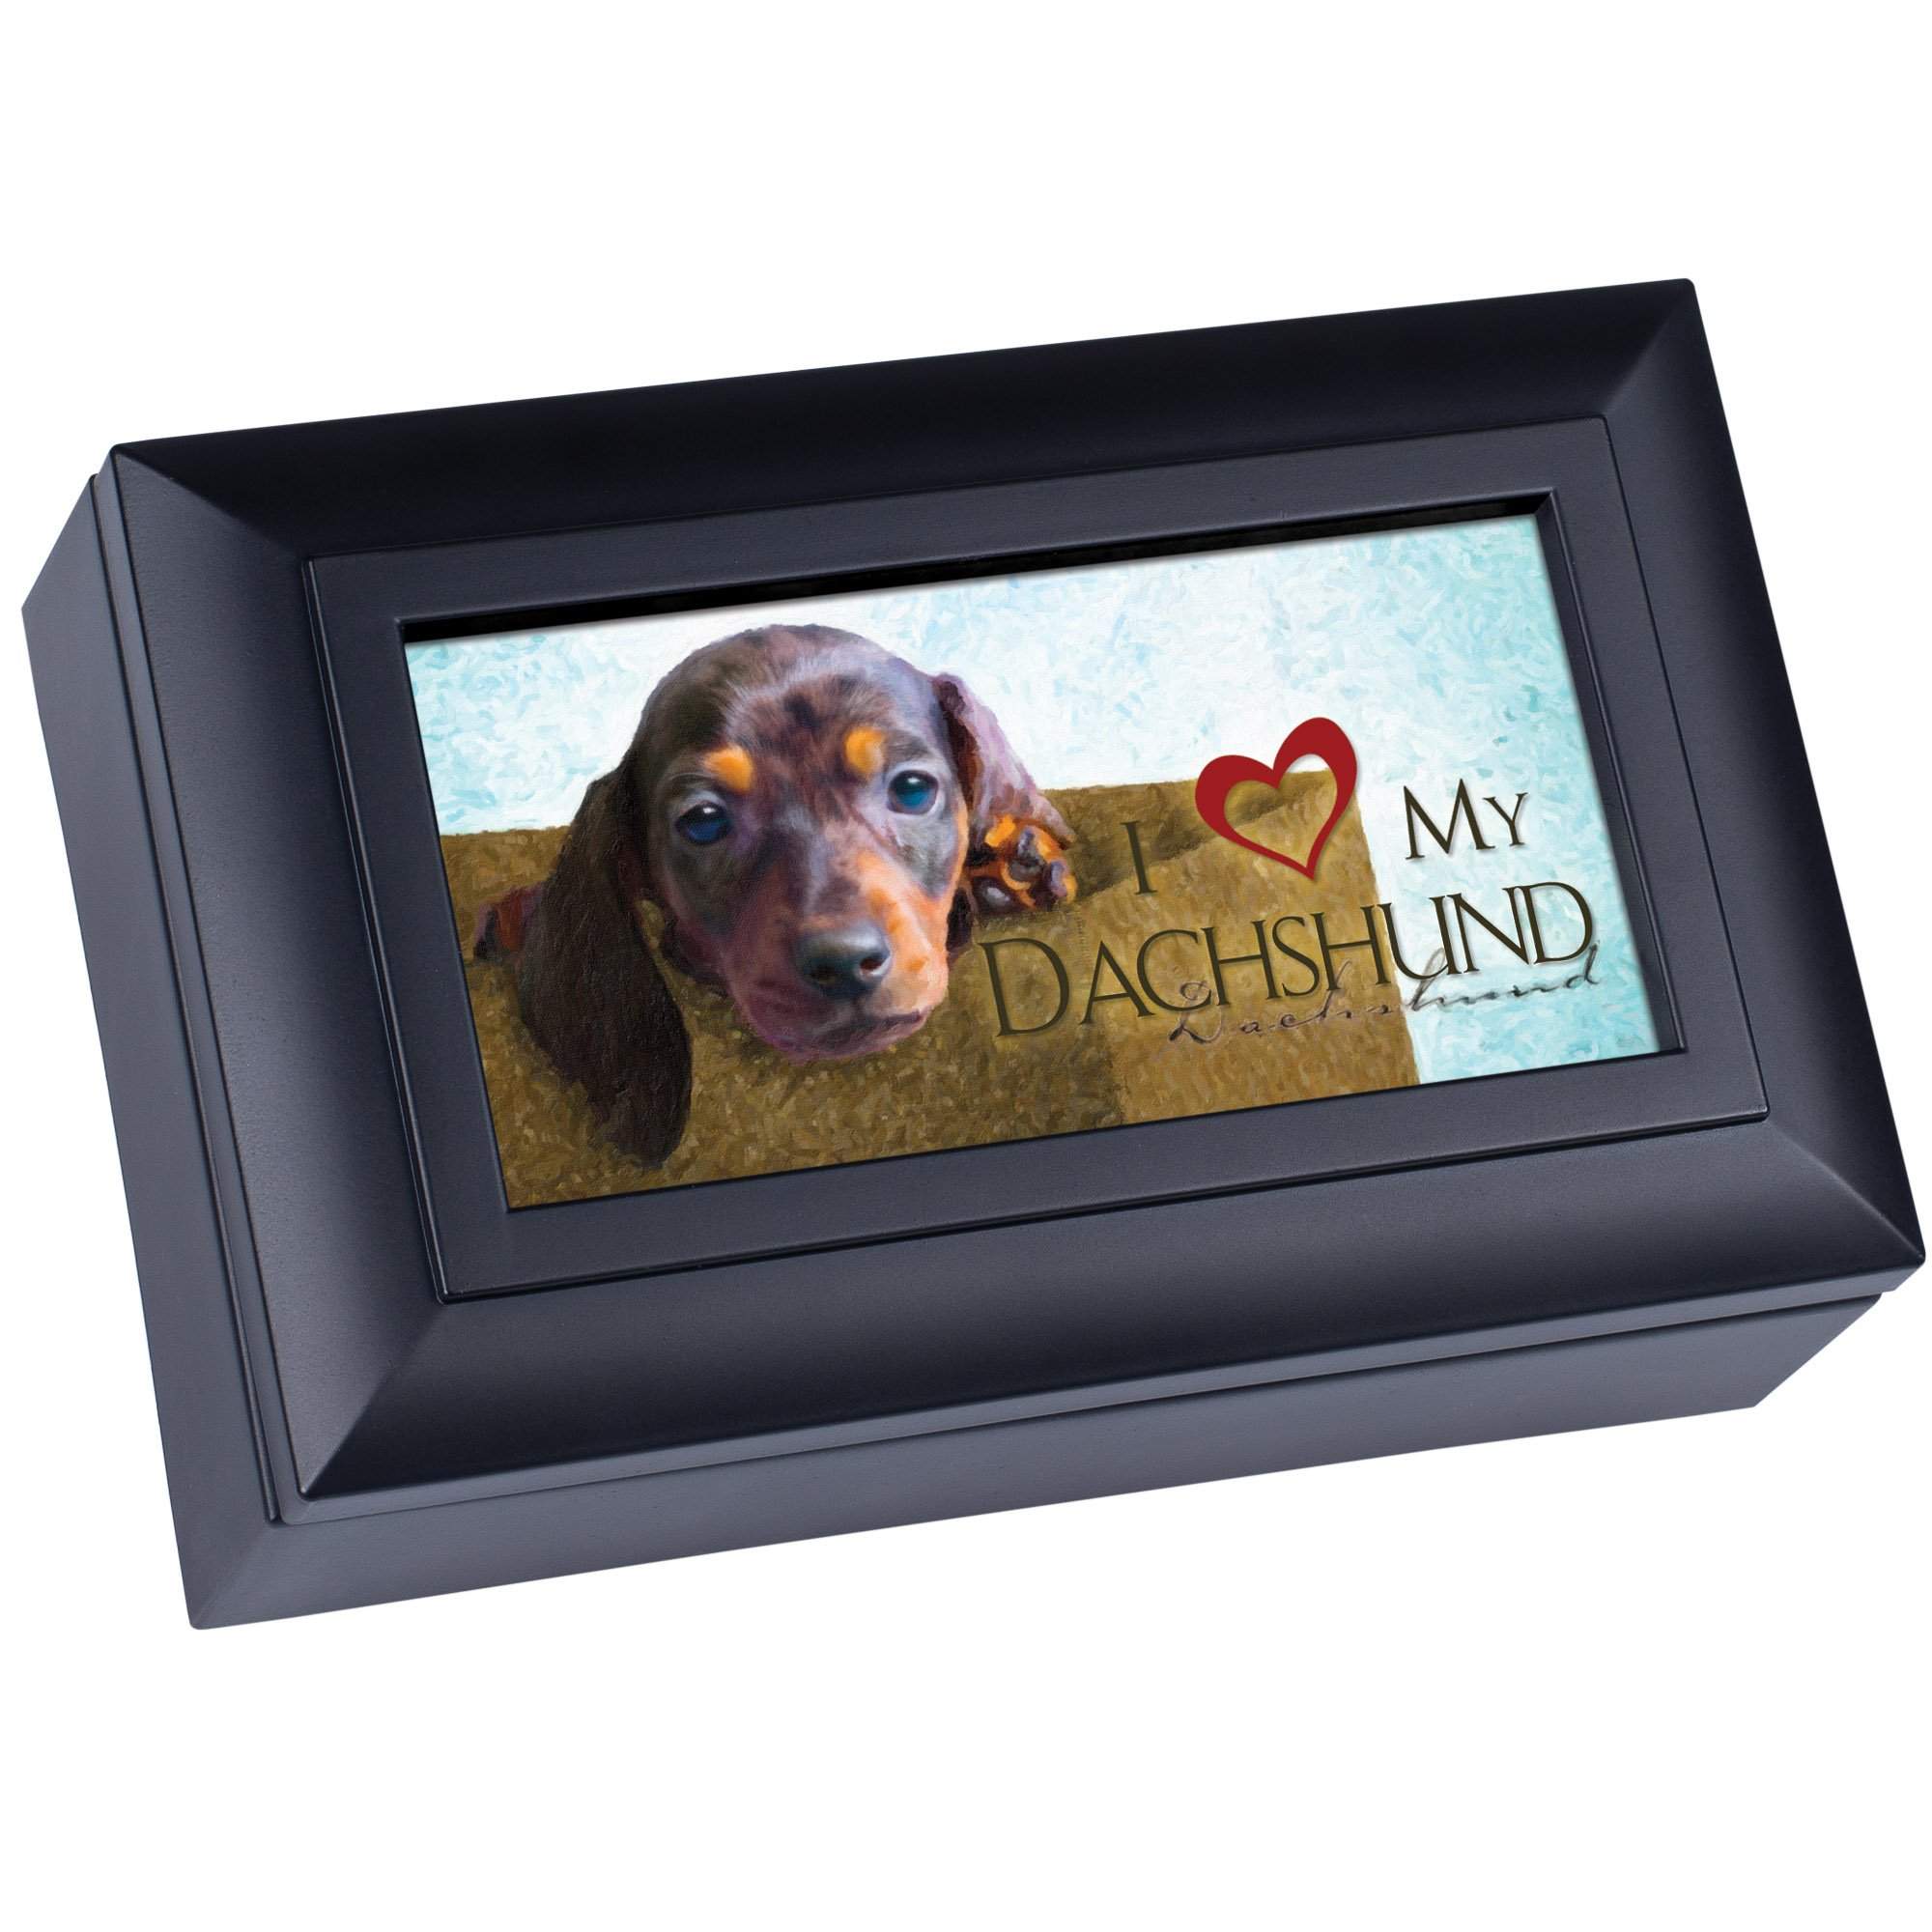 Love My Dachshund Cottage Garden Matte Black Finish Petite Jewelry Music Box - Plays Song Wonderful World